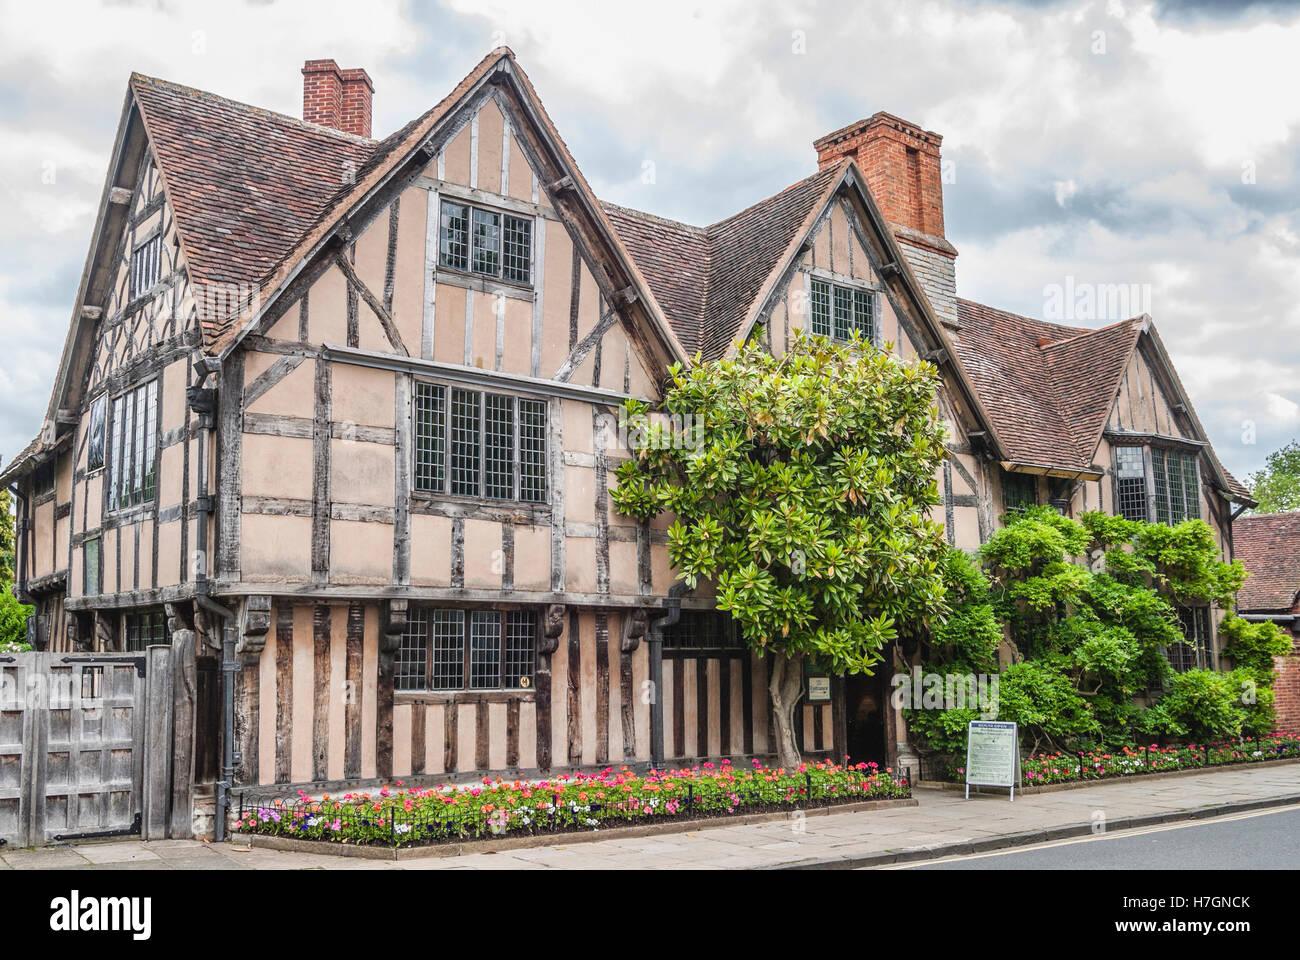 Hall's Croft, Stratford upon Avon, Warwickshire, England - Stock Image